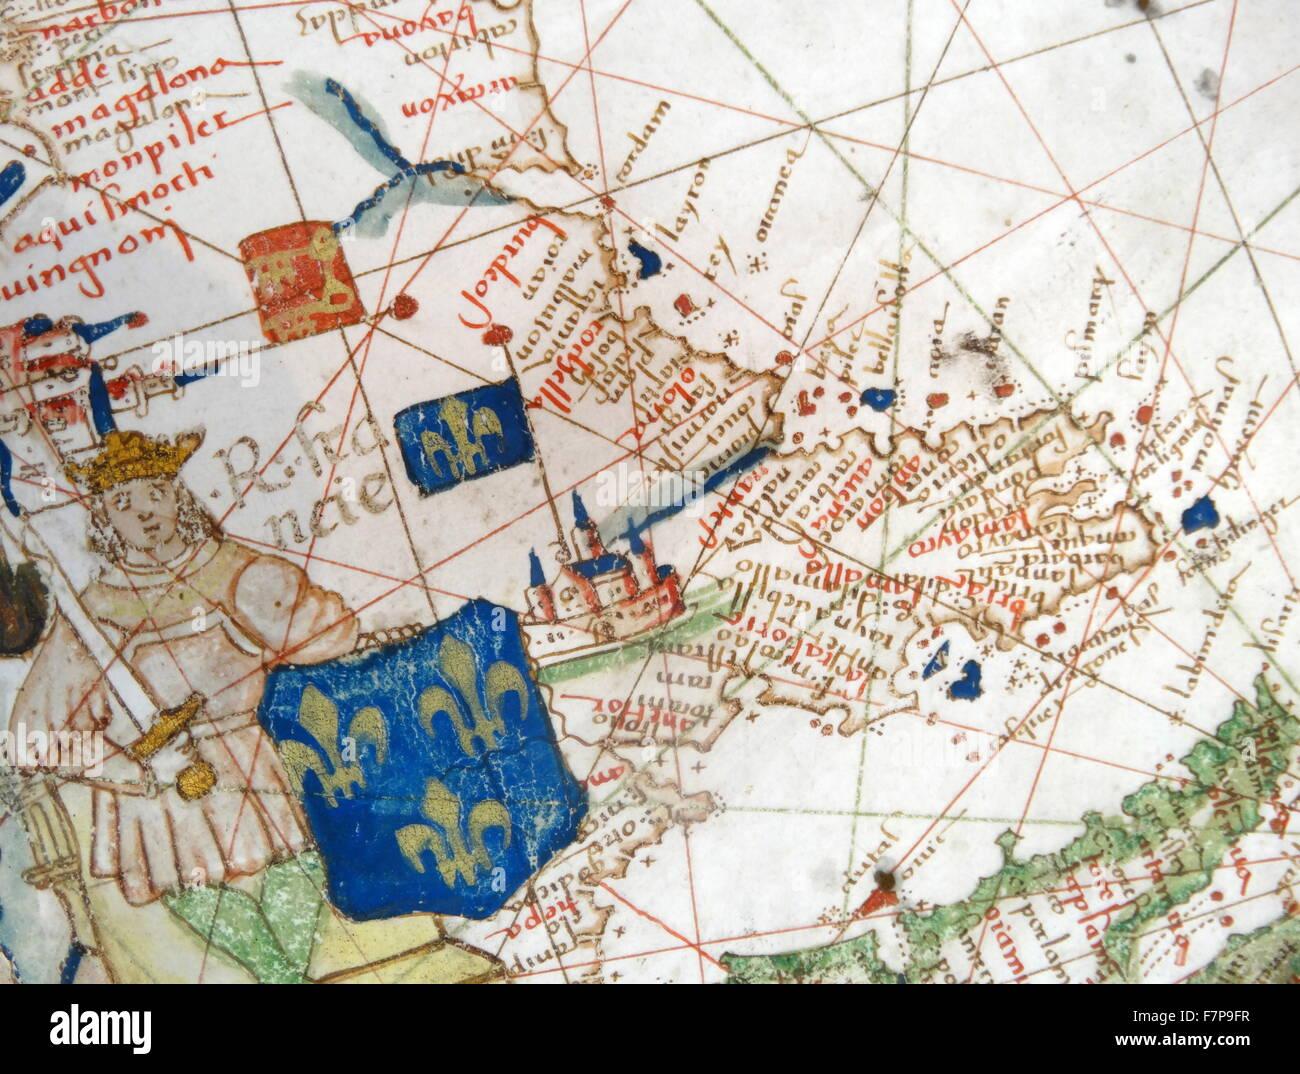 Mapa de Europa renacentista, Jacopo Russo 1528, detalle Imagen De Stock